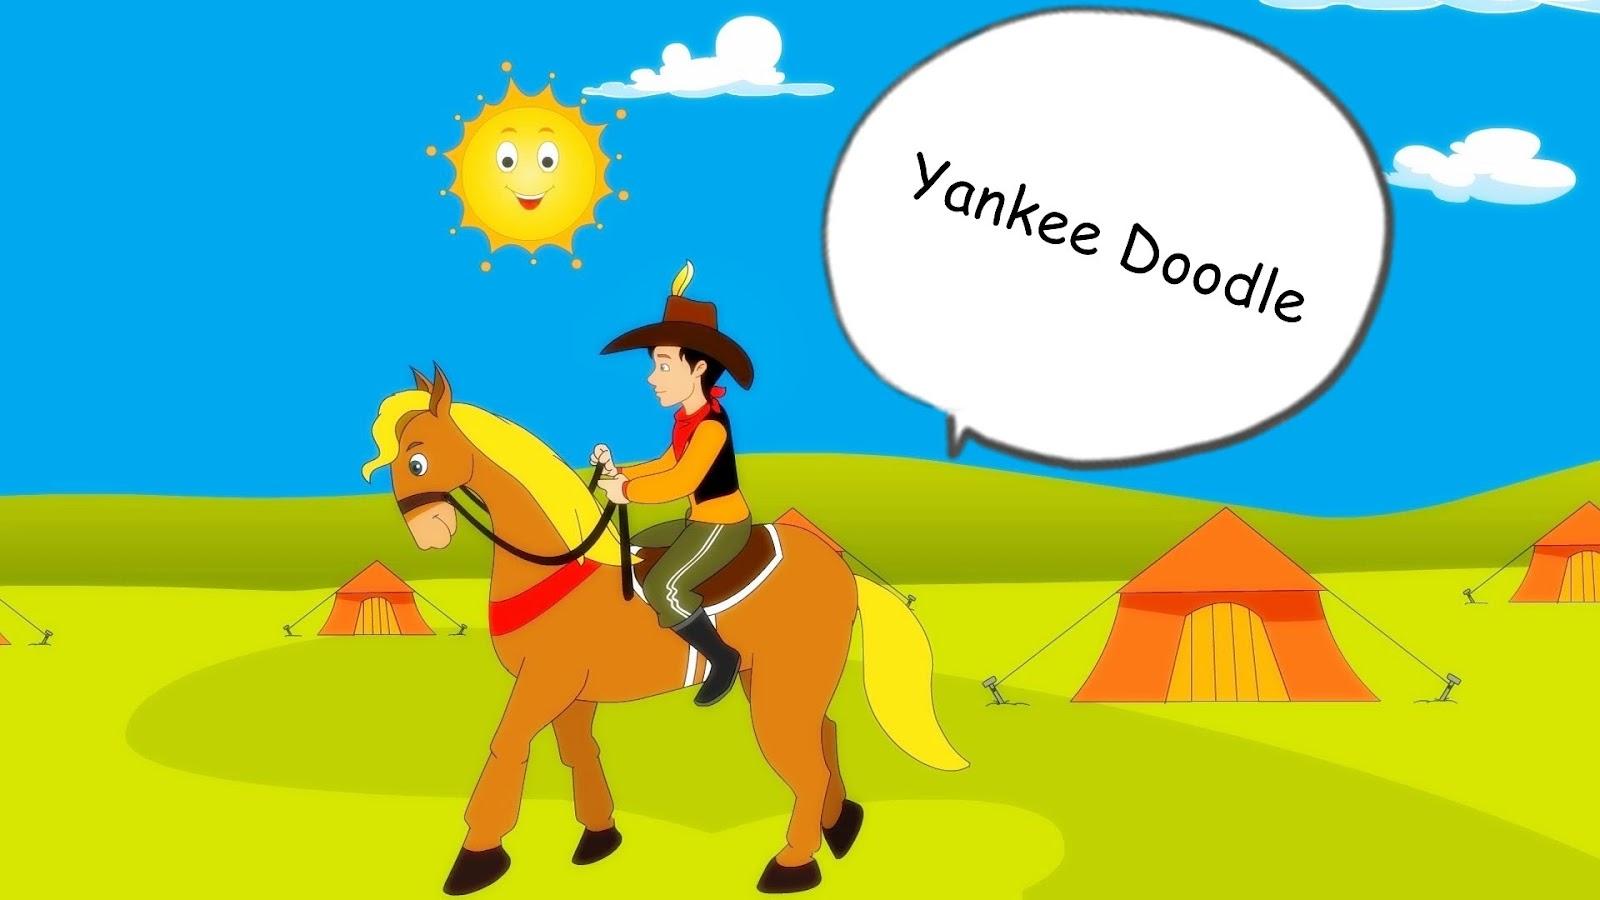 Yankee Doodle | Fun With